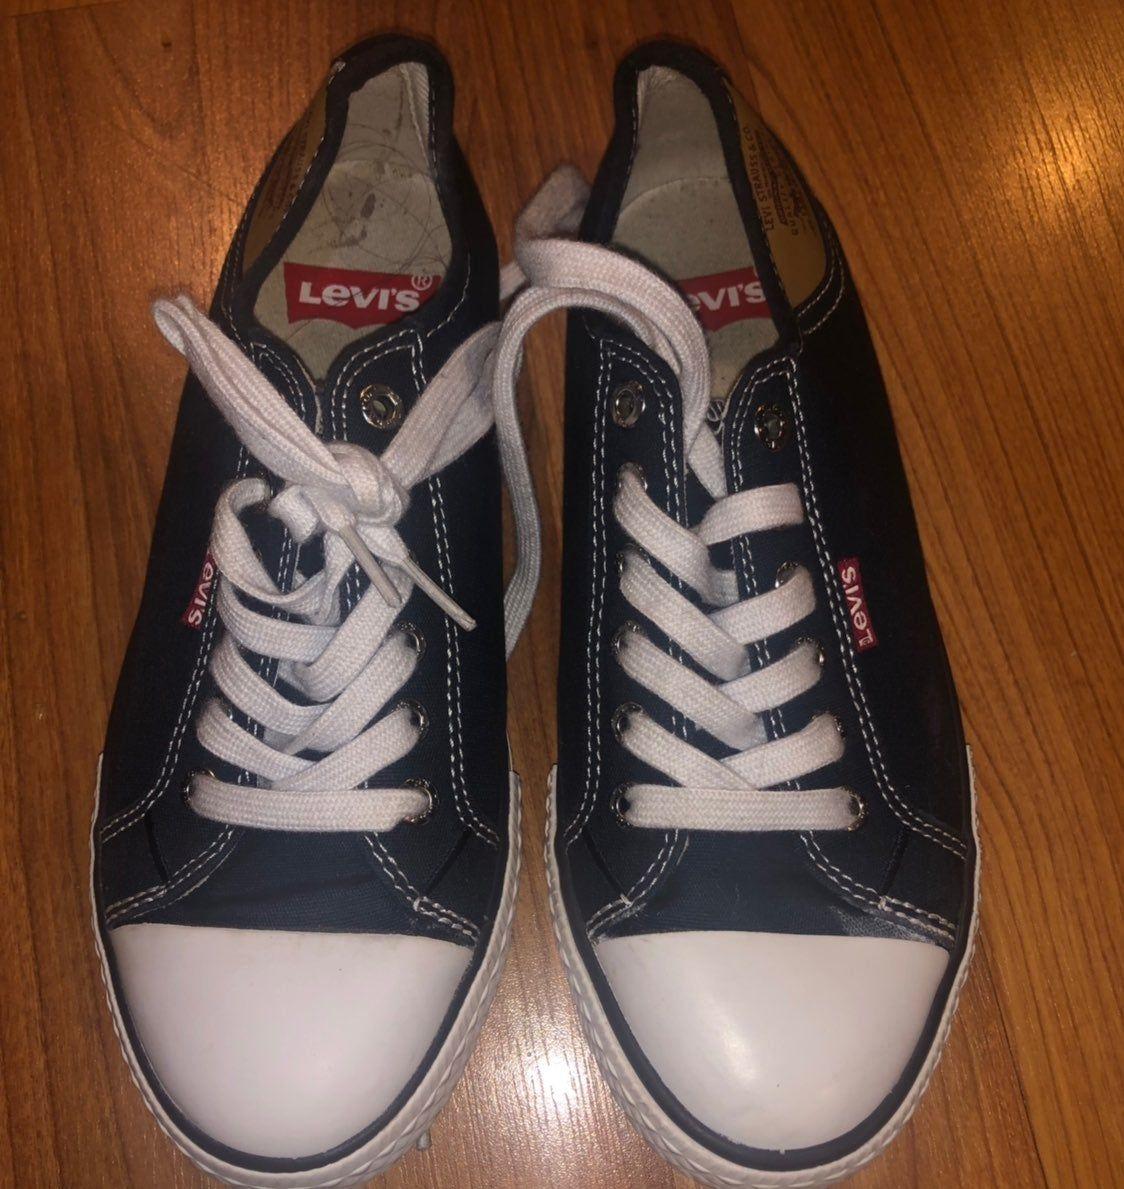 levi's converse style shoes